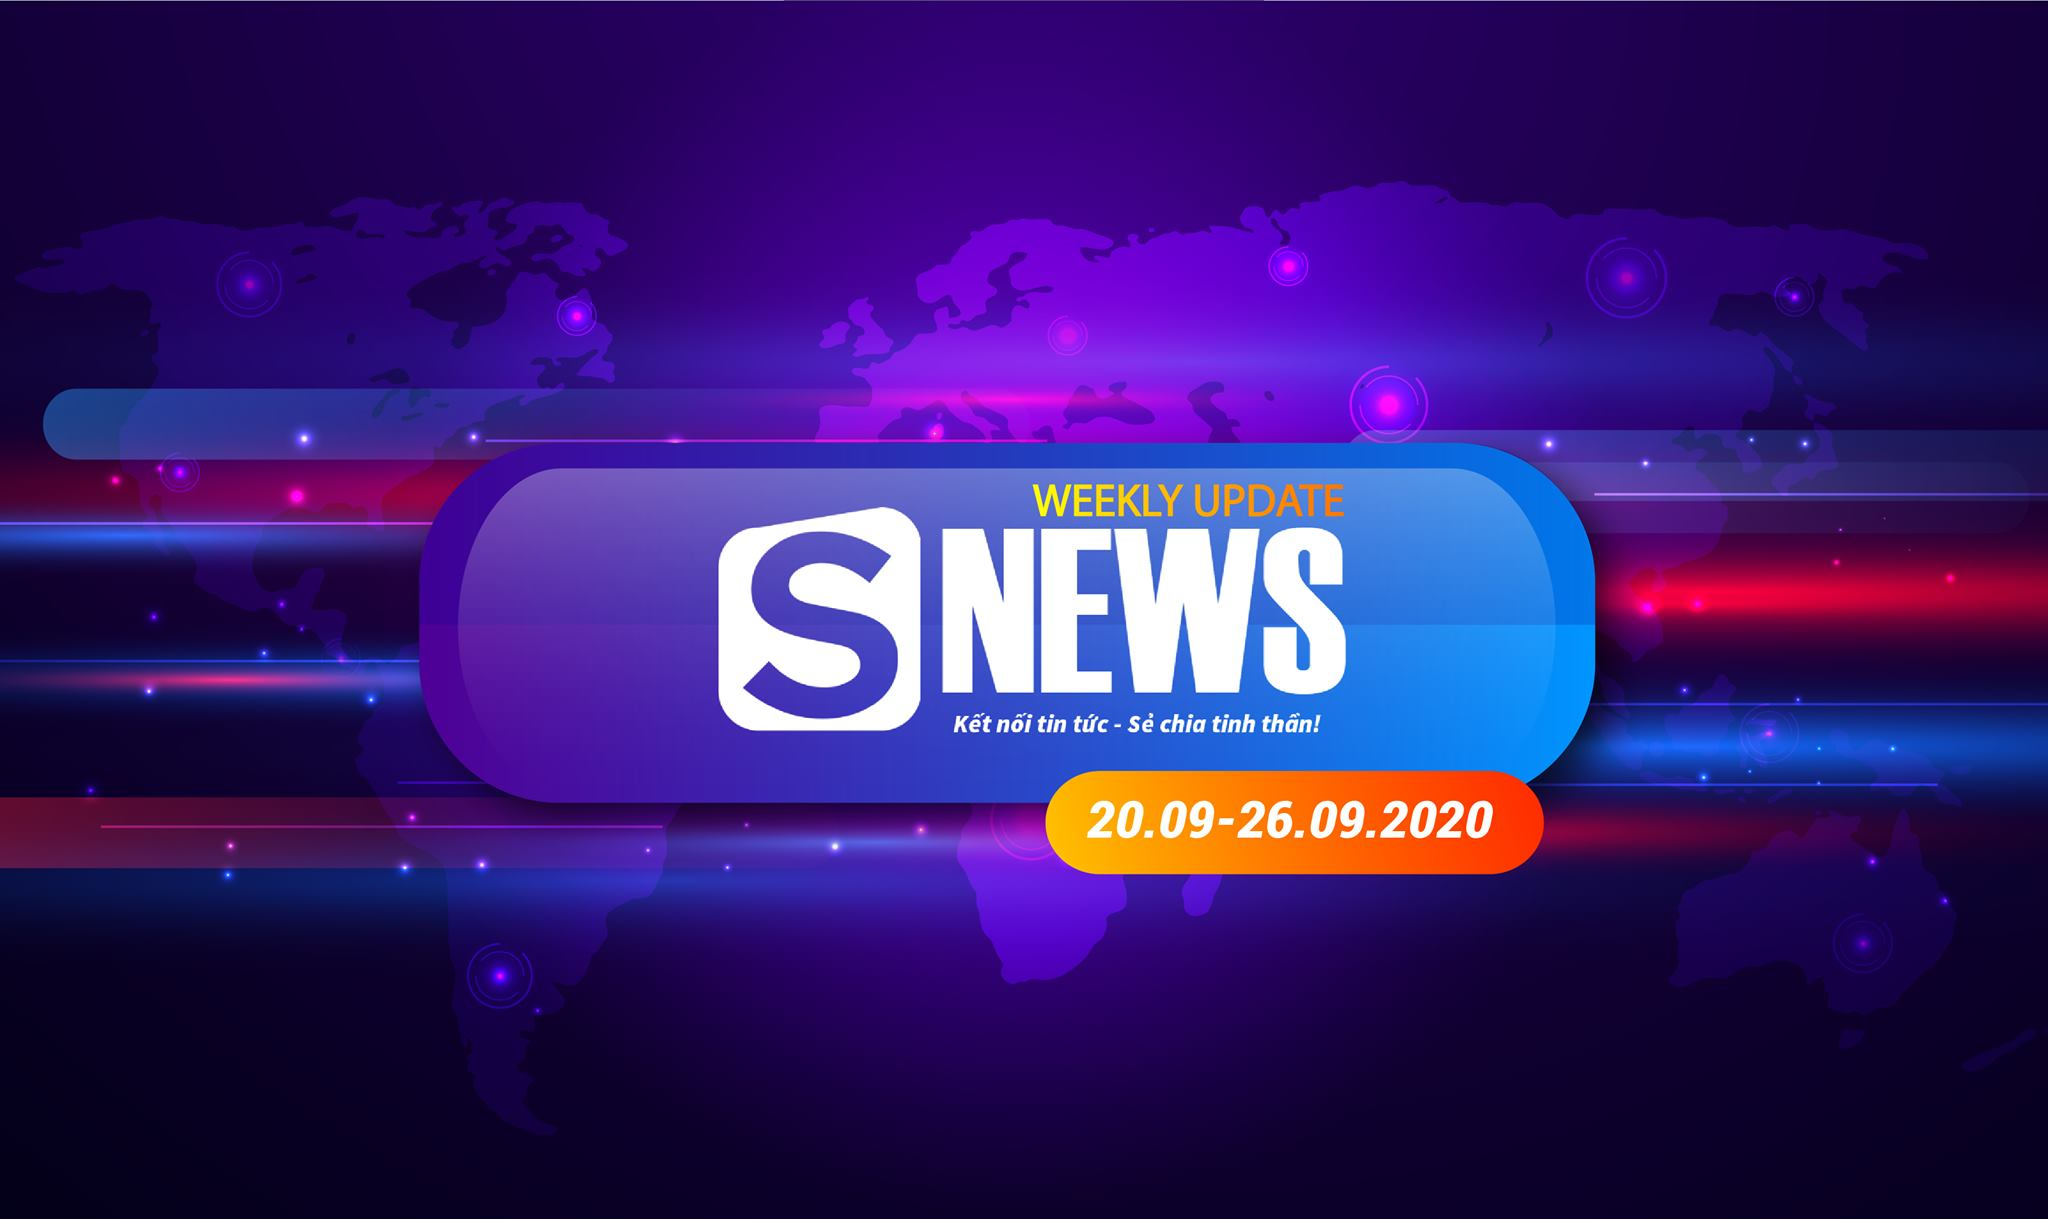 Tổng hợp tin tức Sapo tuần qua: 20.09 - 26.09